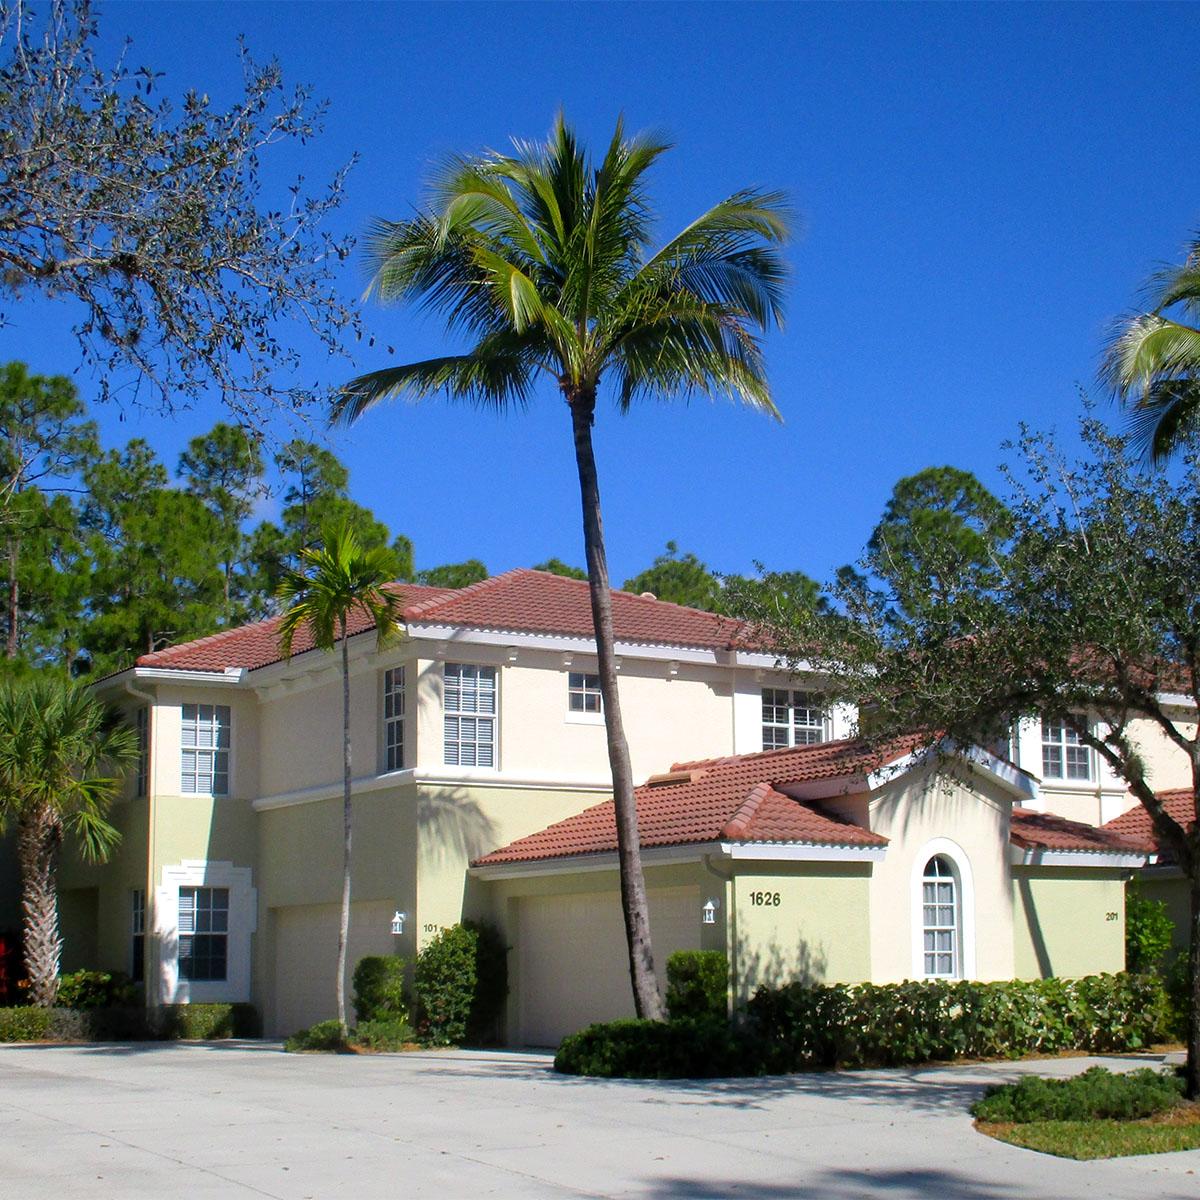 Bimini Bay II | Tarpon Bay Community Association, Inc. - Naples, Florida